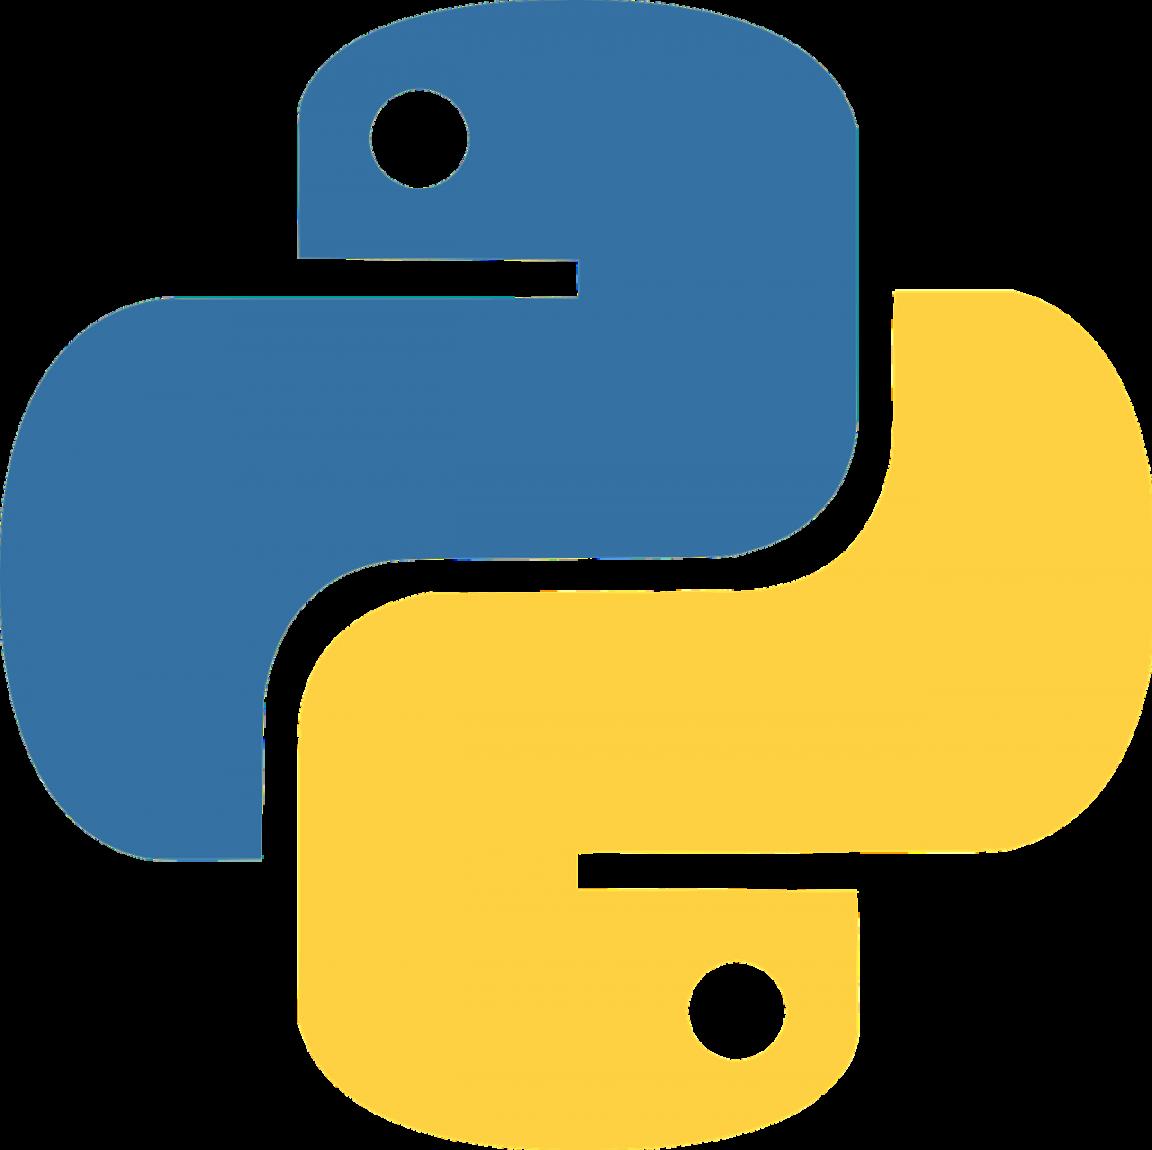 Python Logo Clojure JavaScrip - Python Logo Clipart